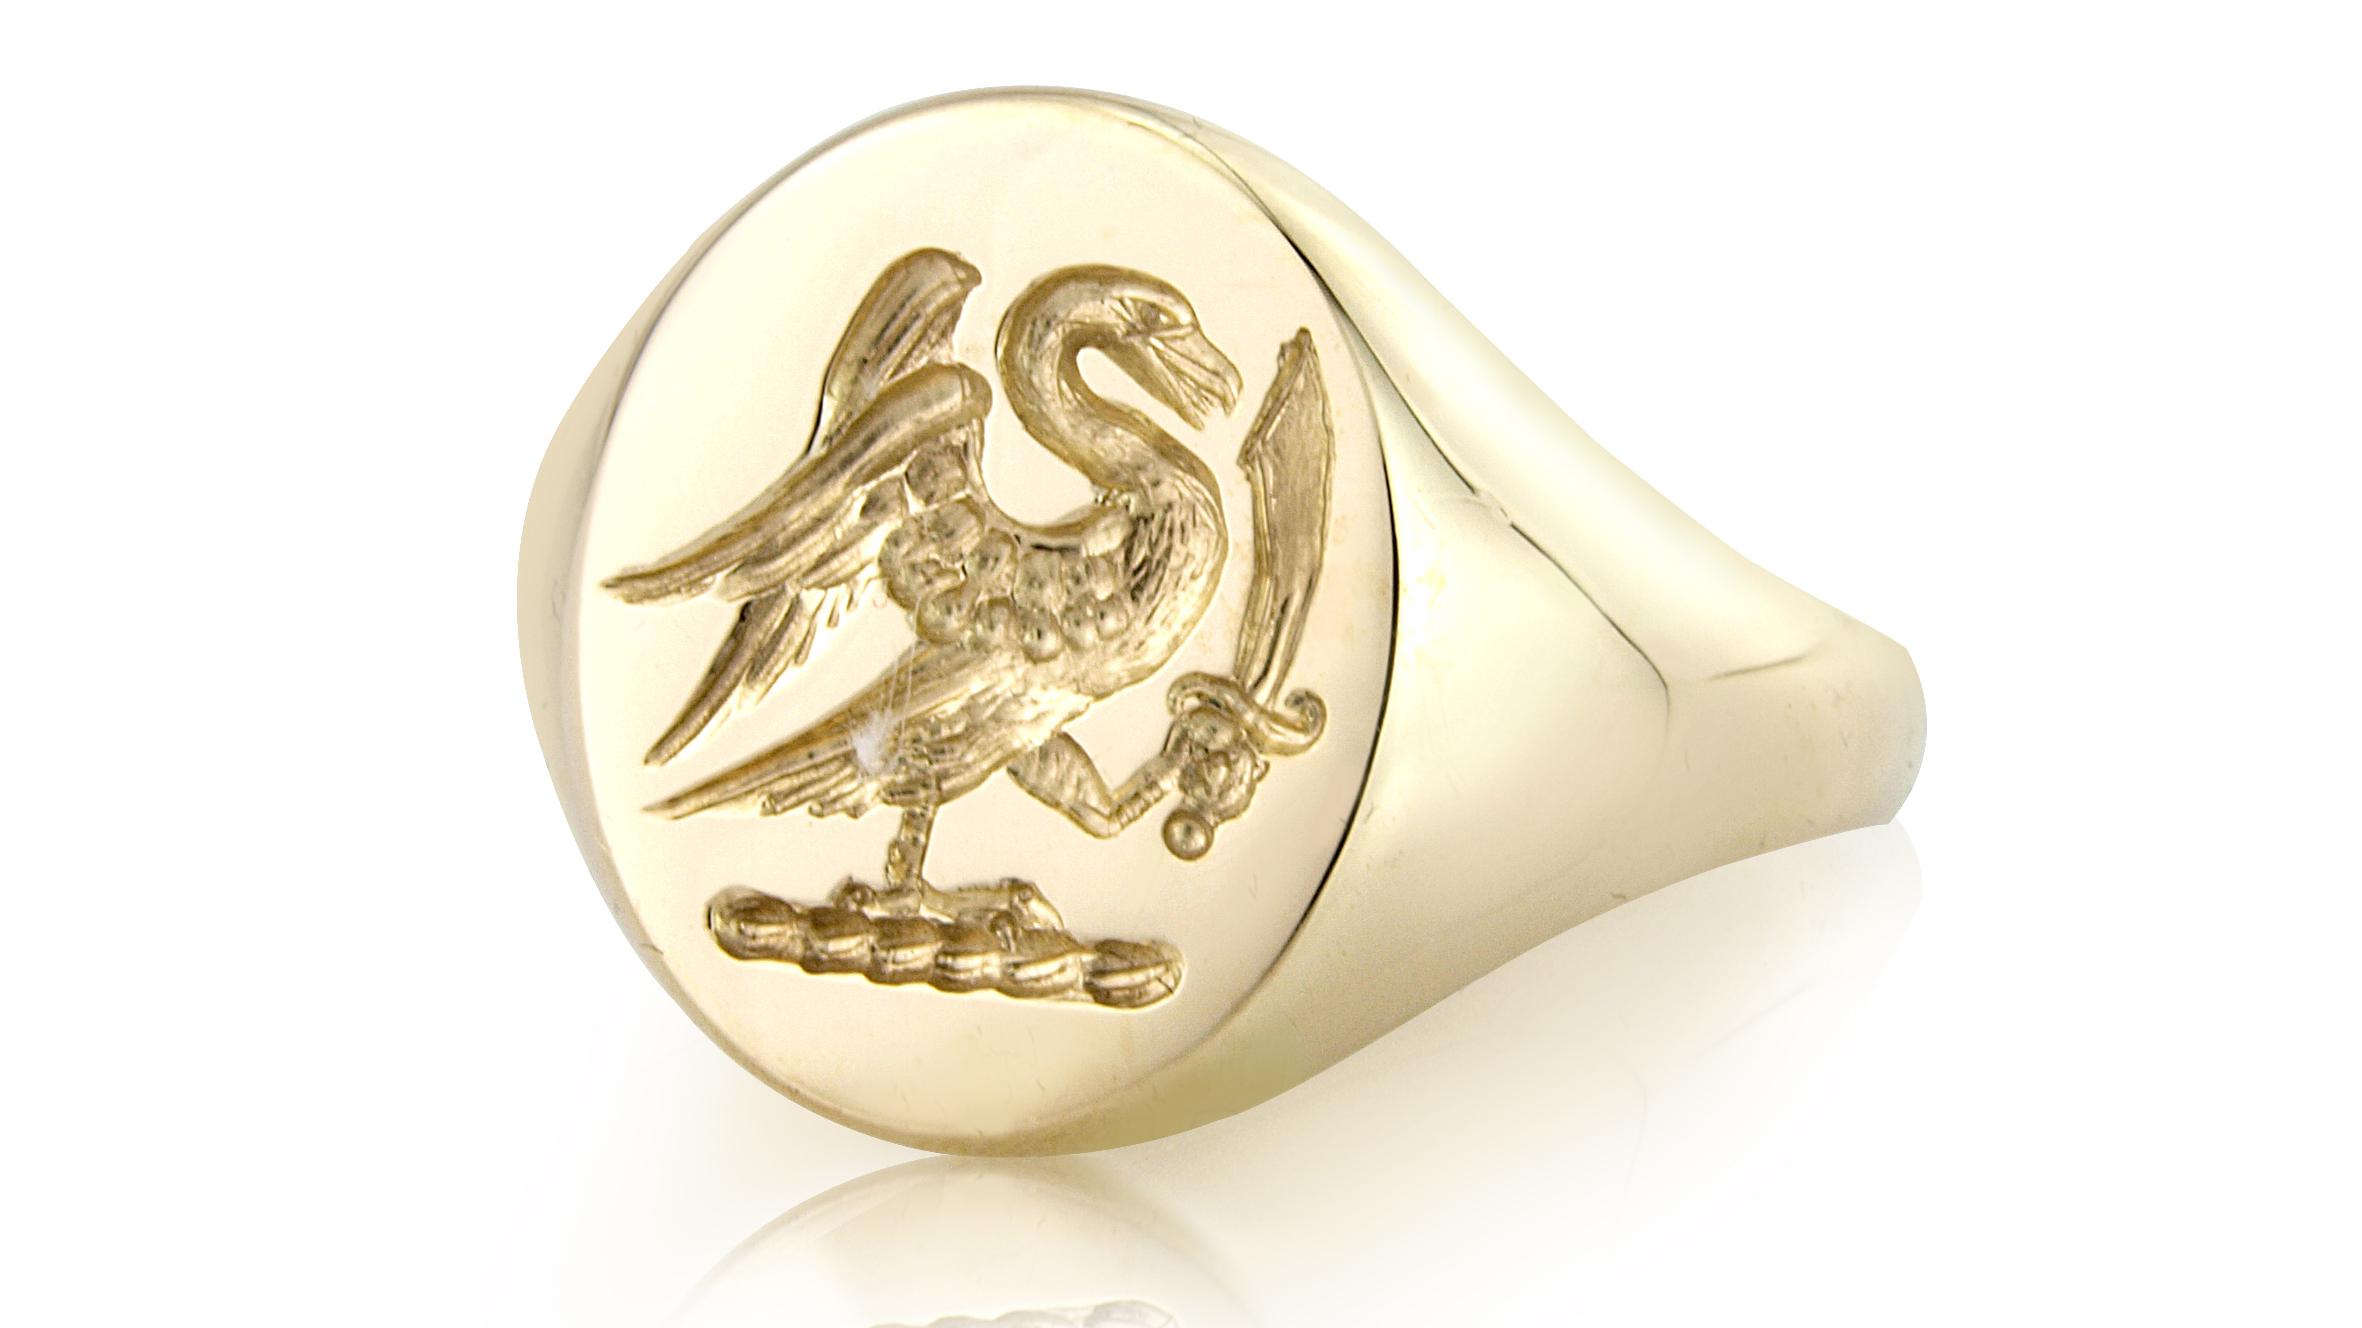 Swan Signet Ring from Rebus